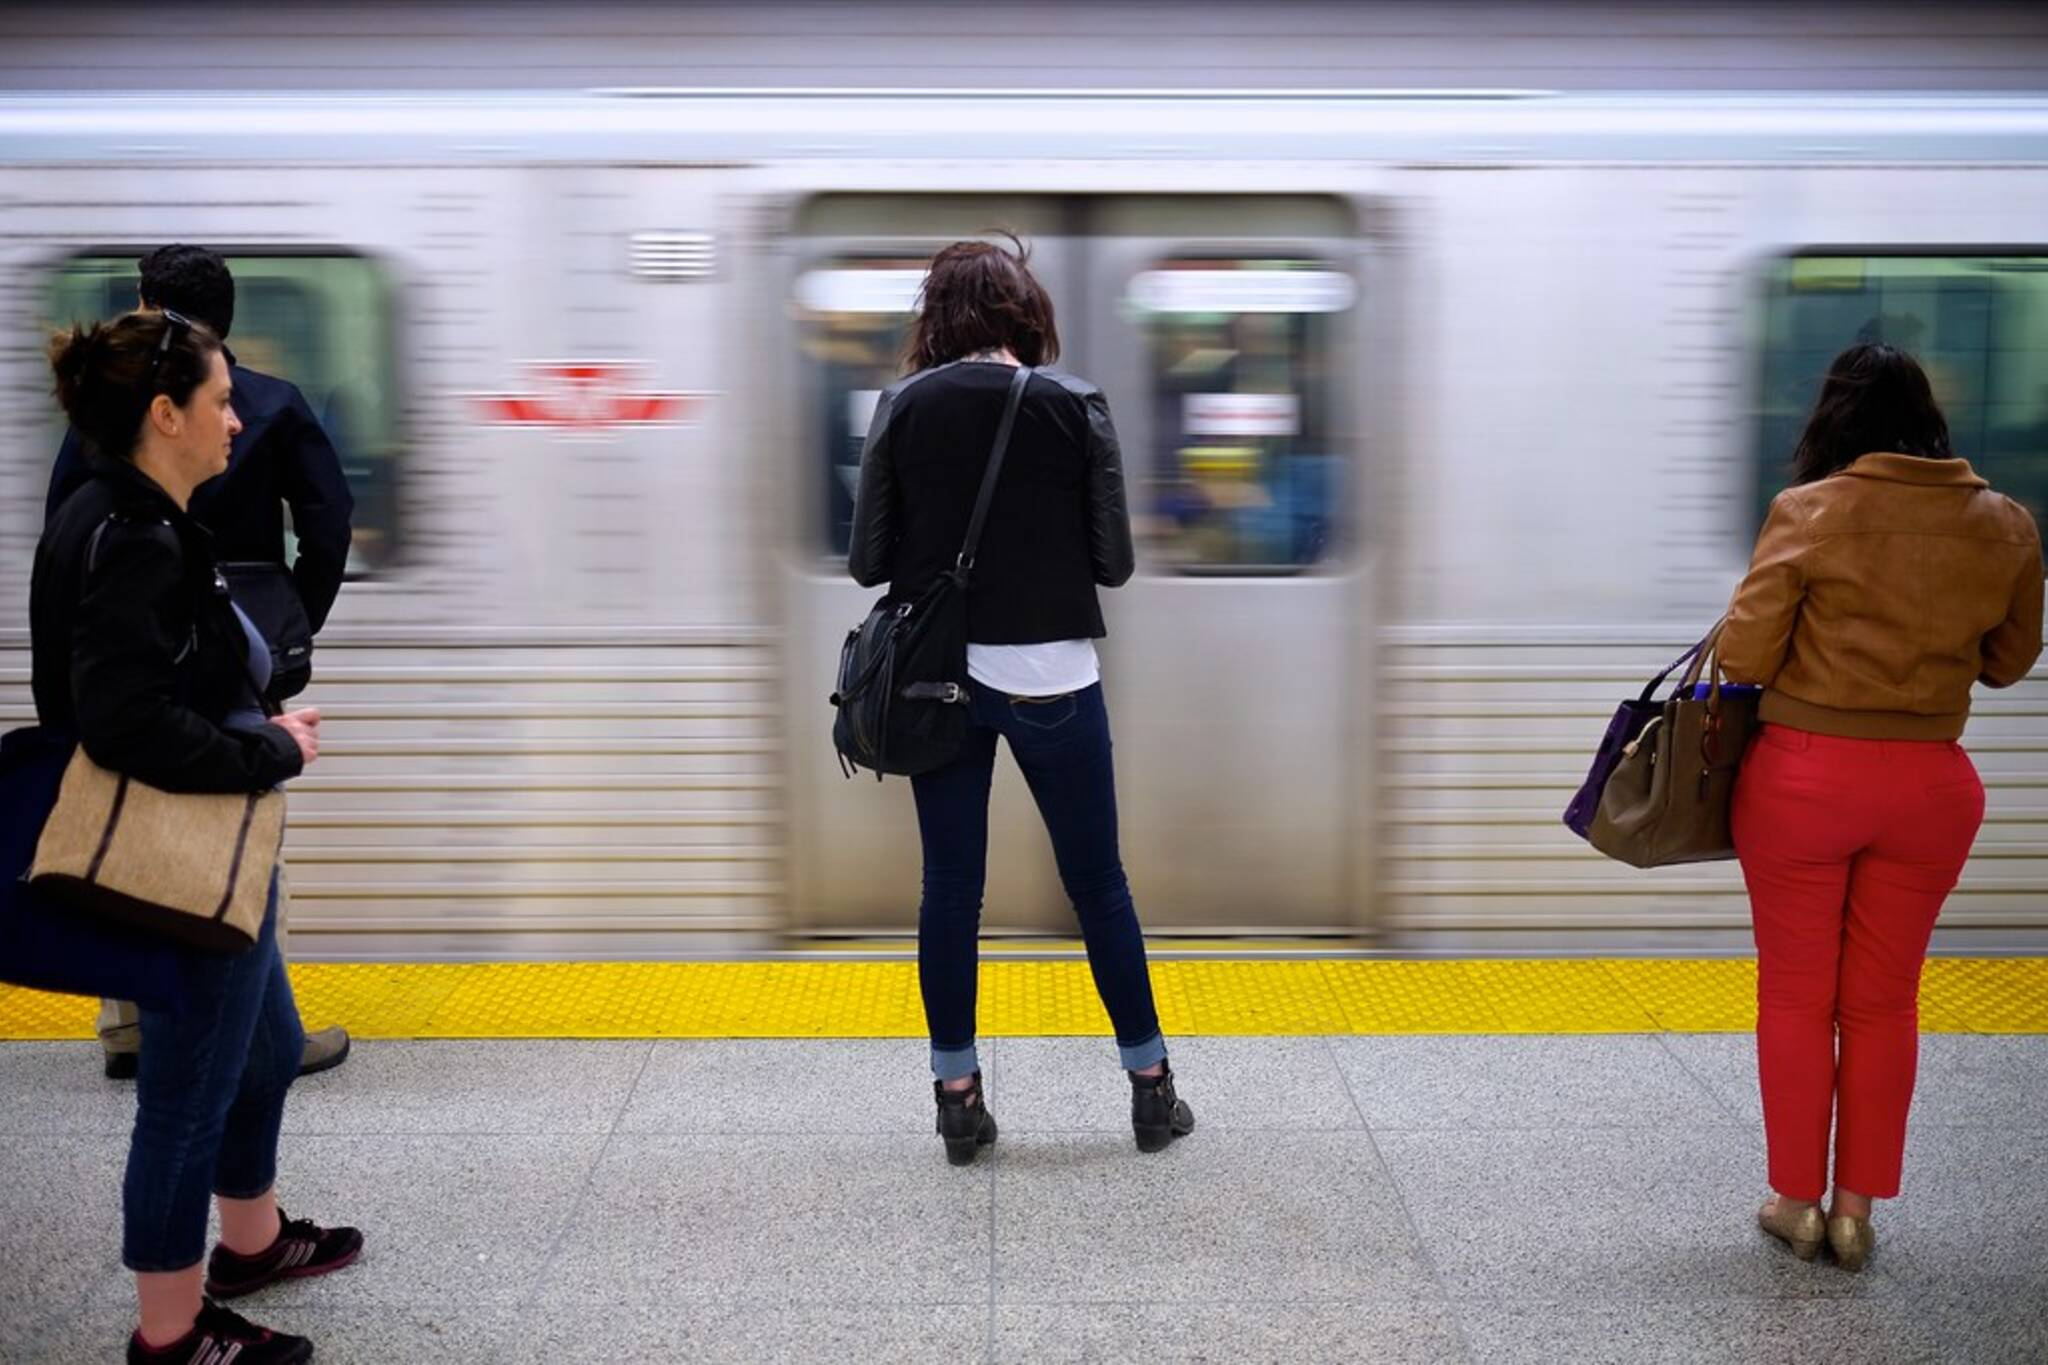 ttc train platform gap